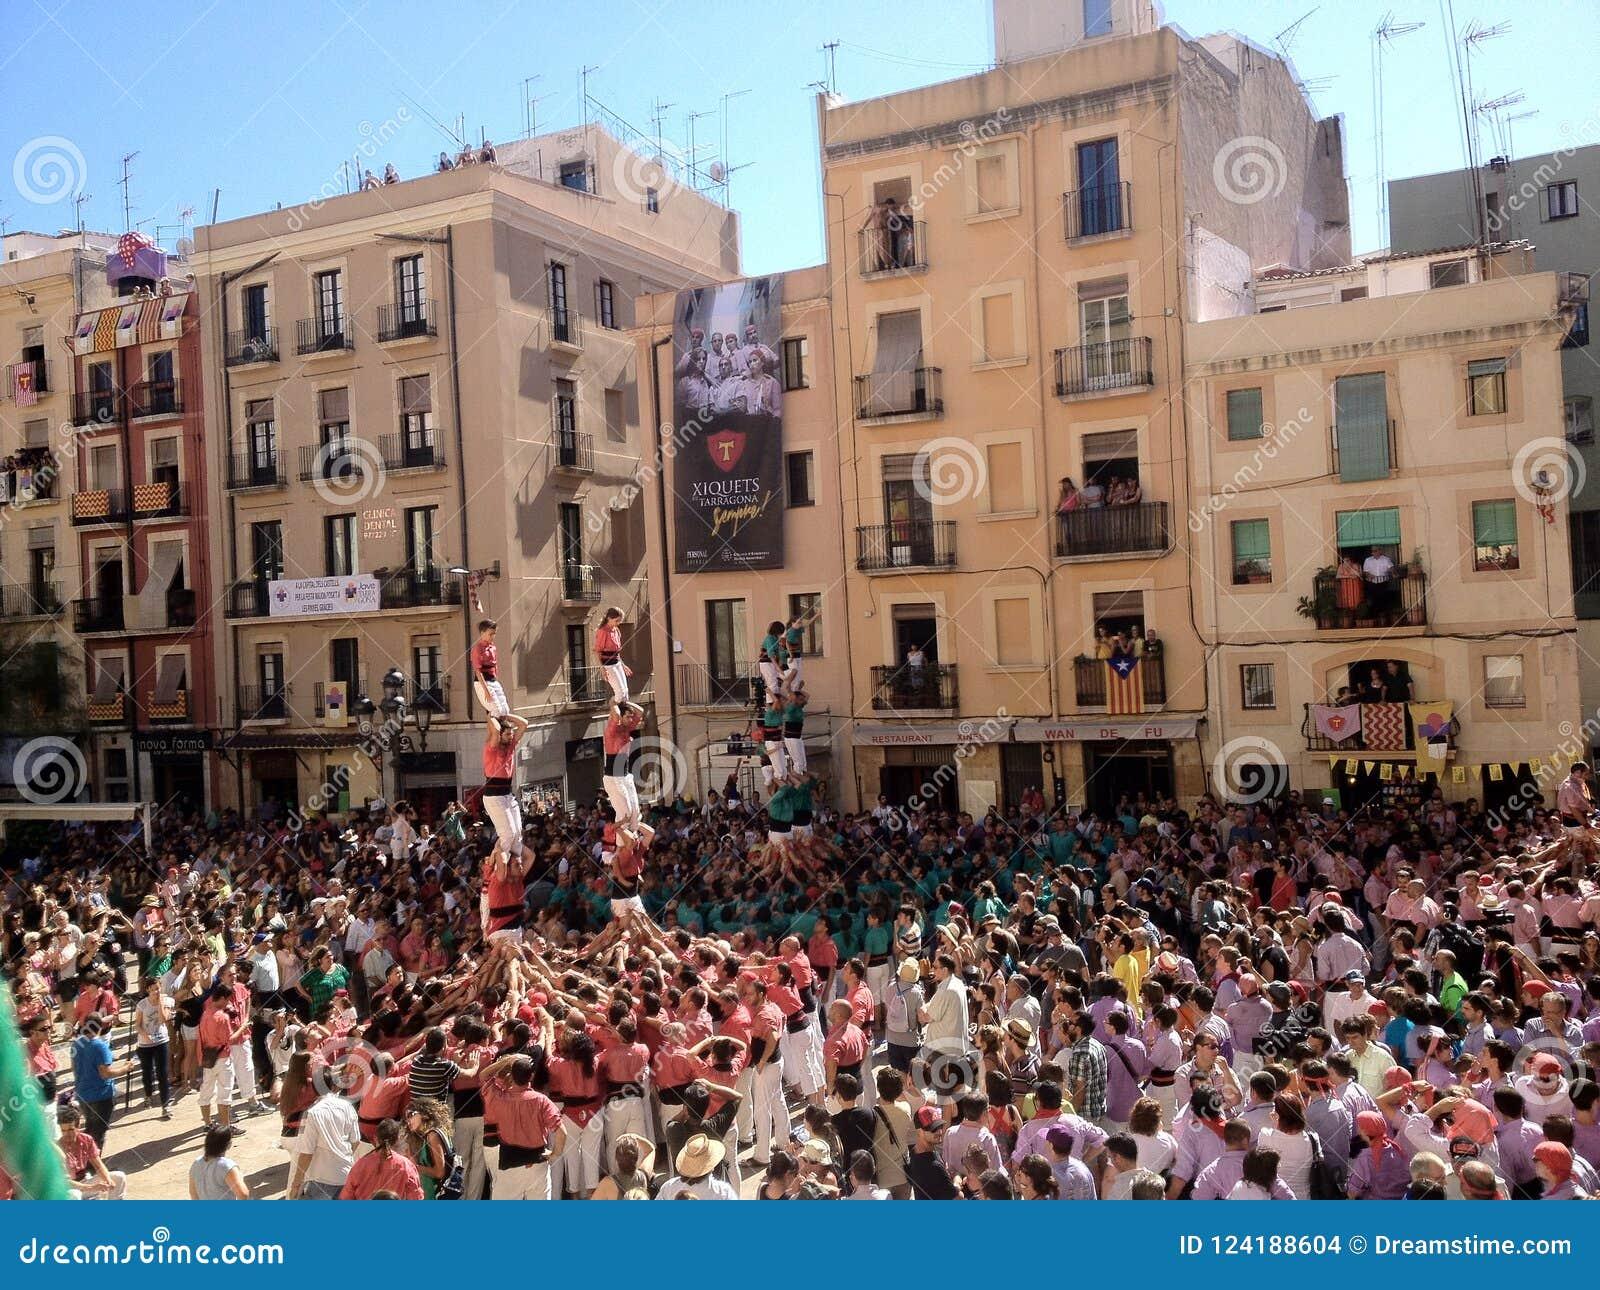 Tarragona, spain -?? setptember 16, 2012: traditional human tow